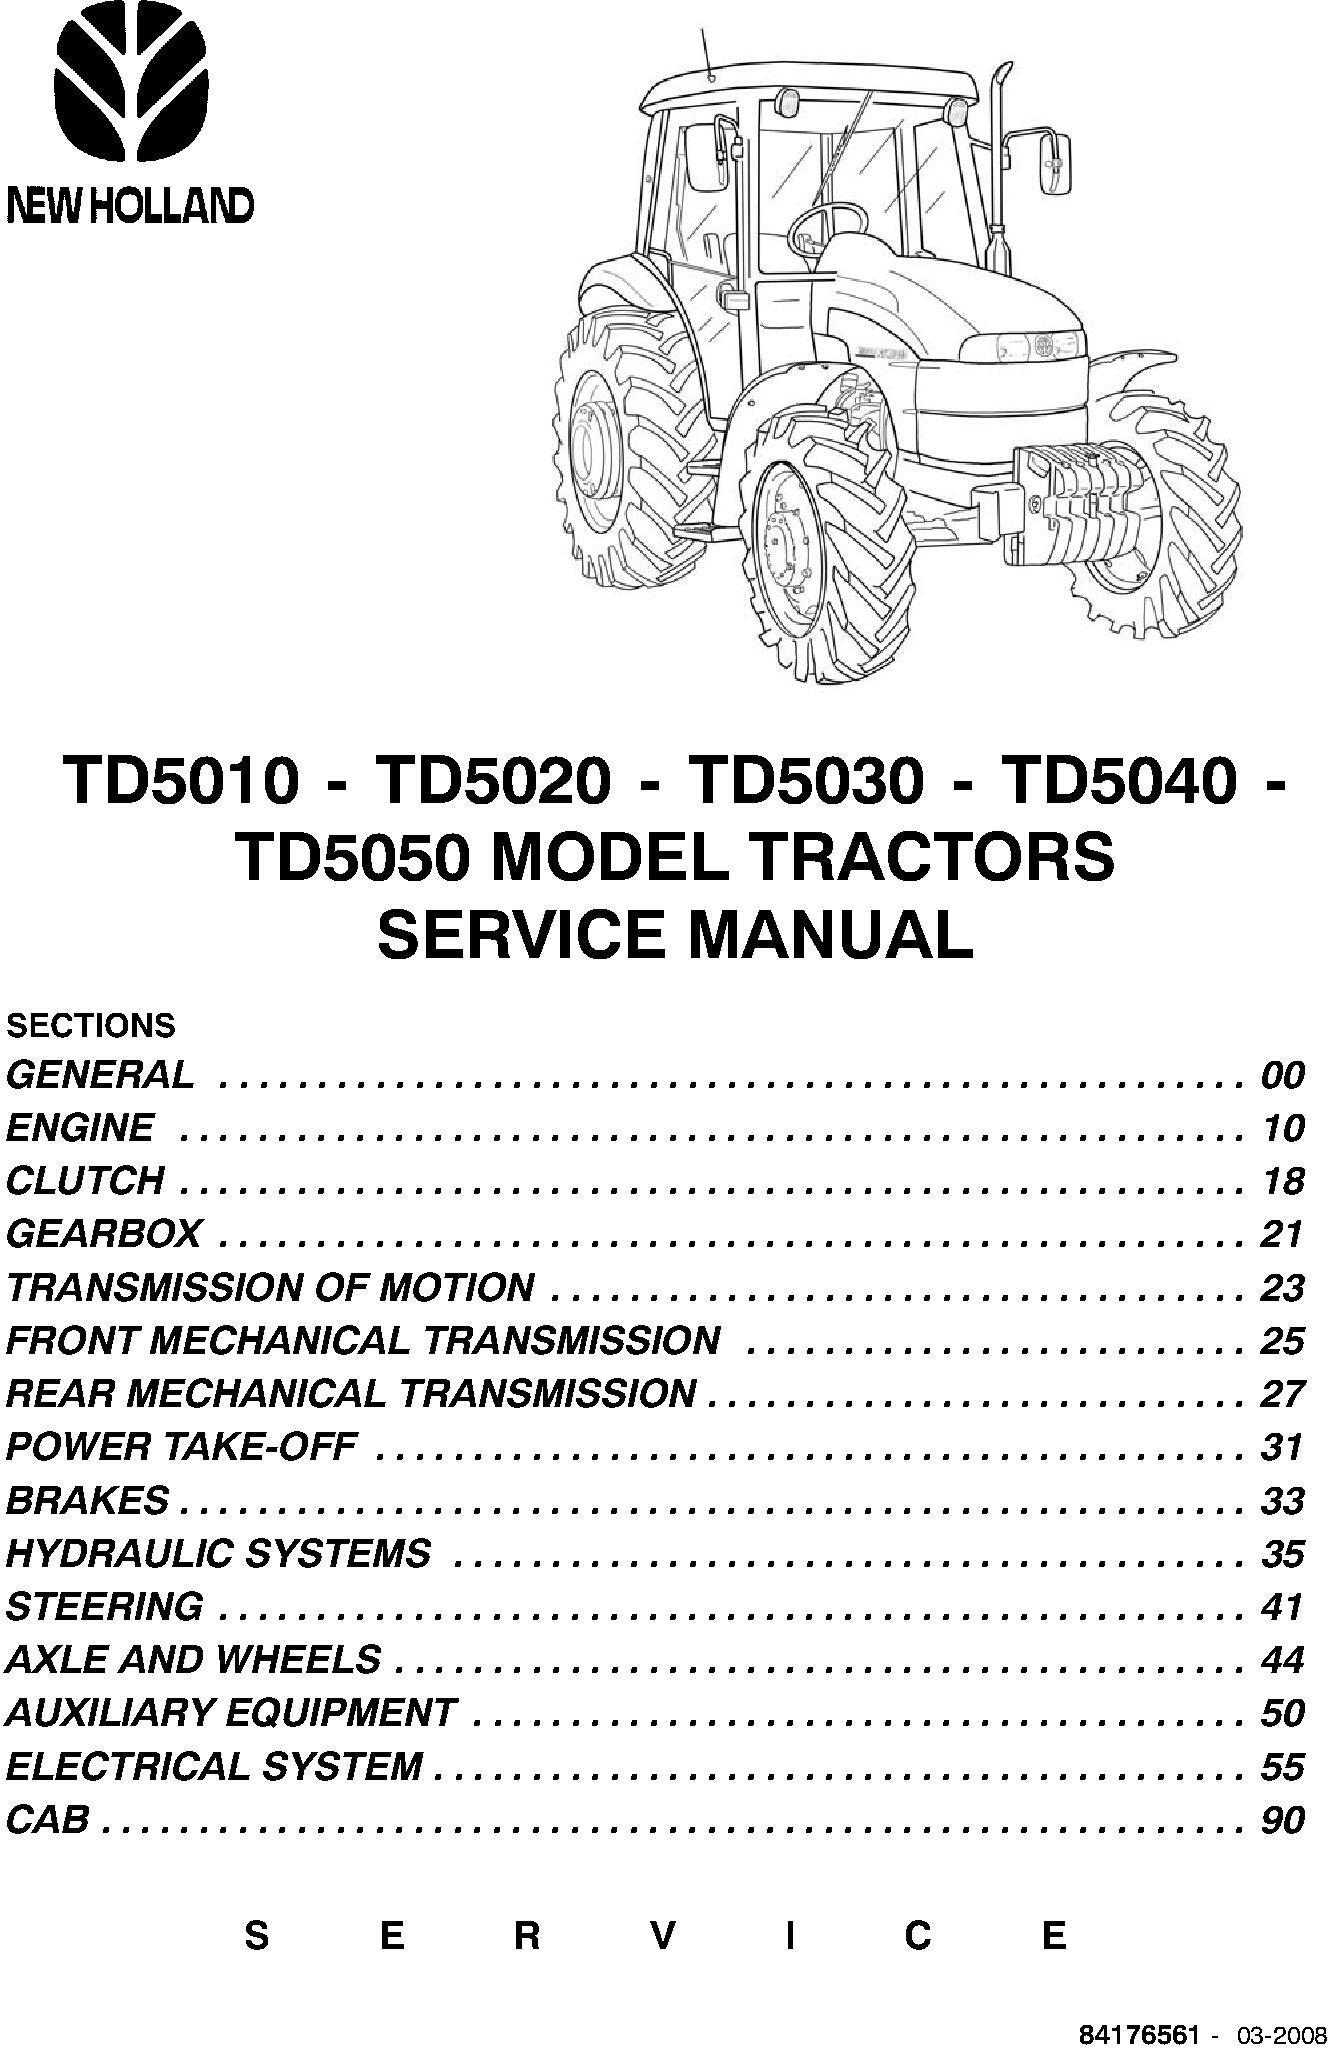 New Holland TD5010/TD5020/TD5030/TD5040/TD5050 Tractors Agricultural Service Manual - 1